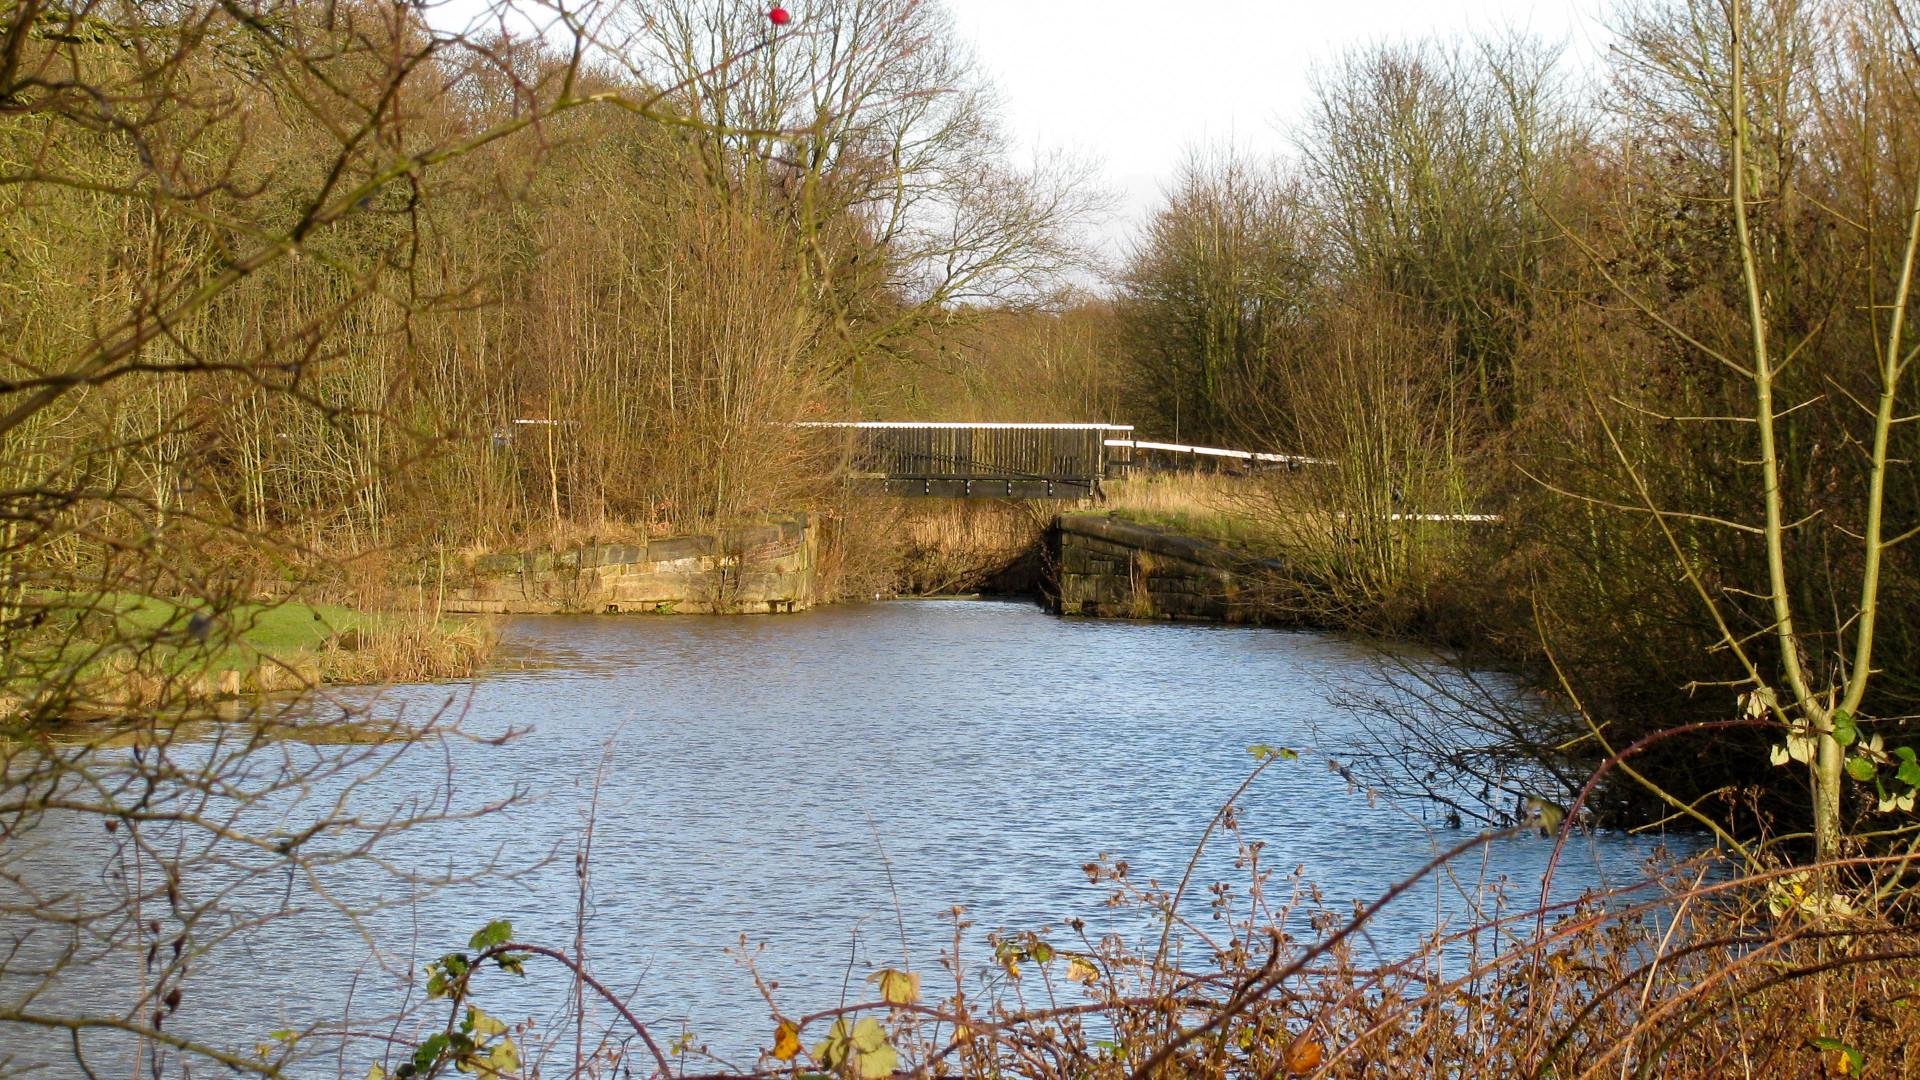 Bewsey Lock, awaiting restoration